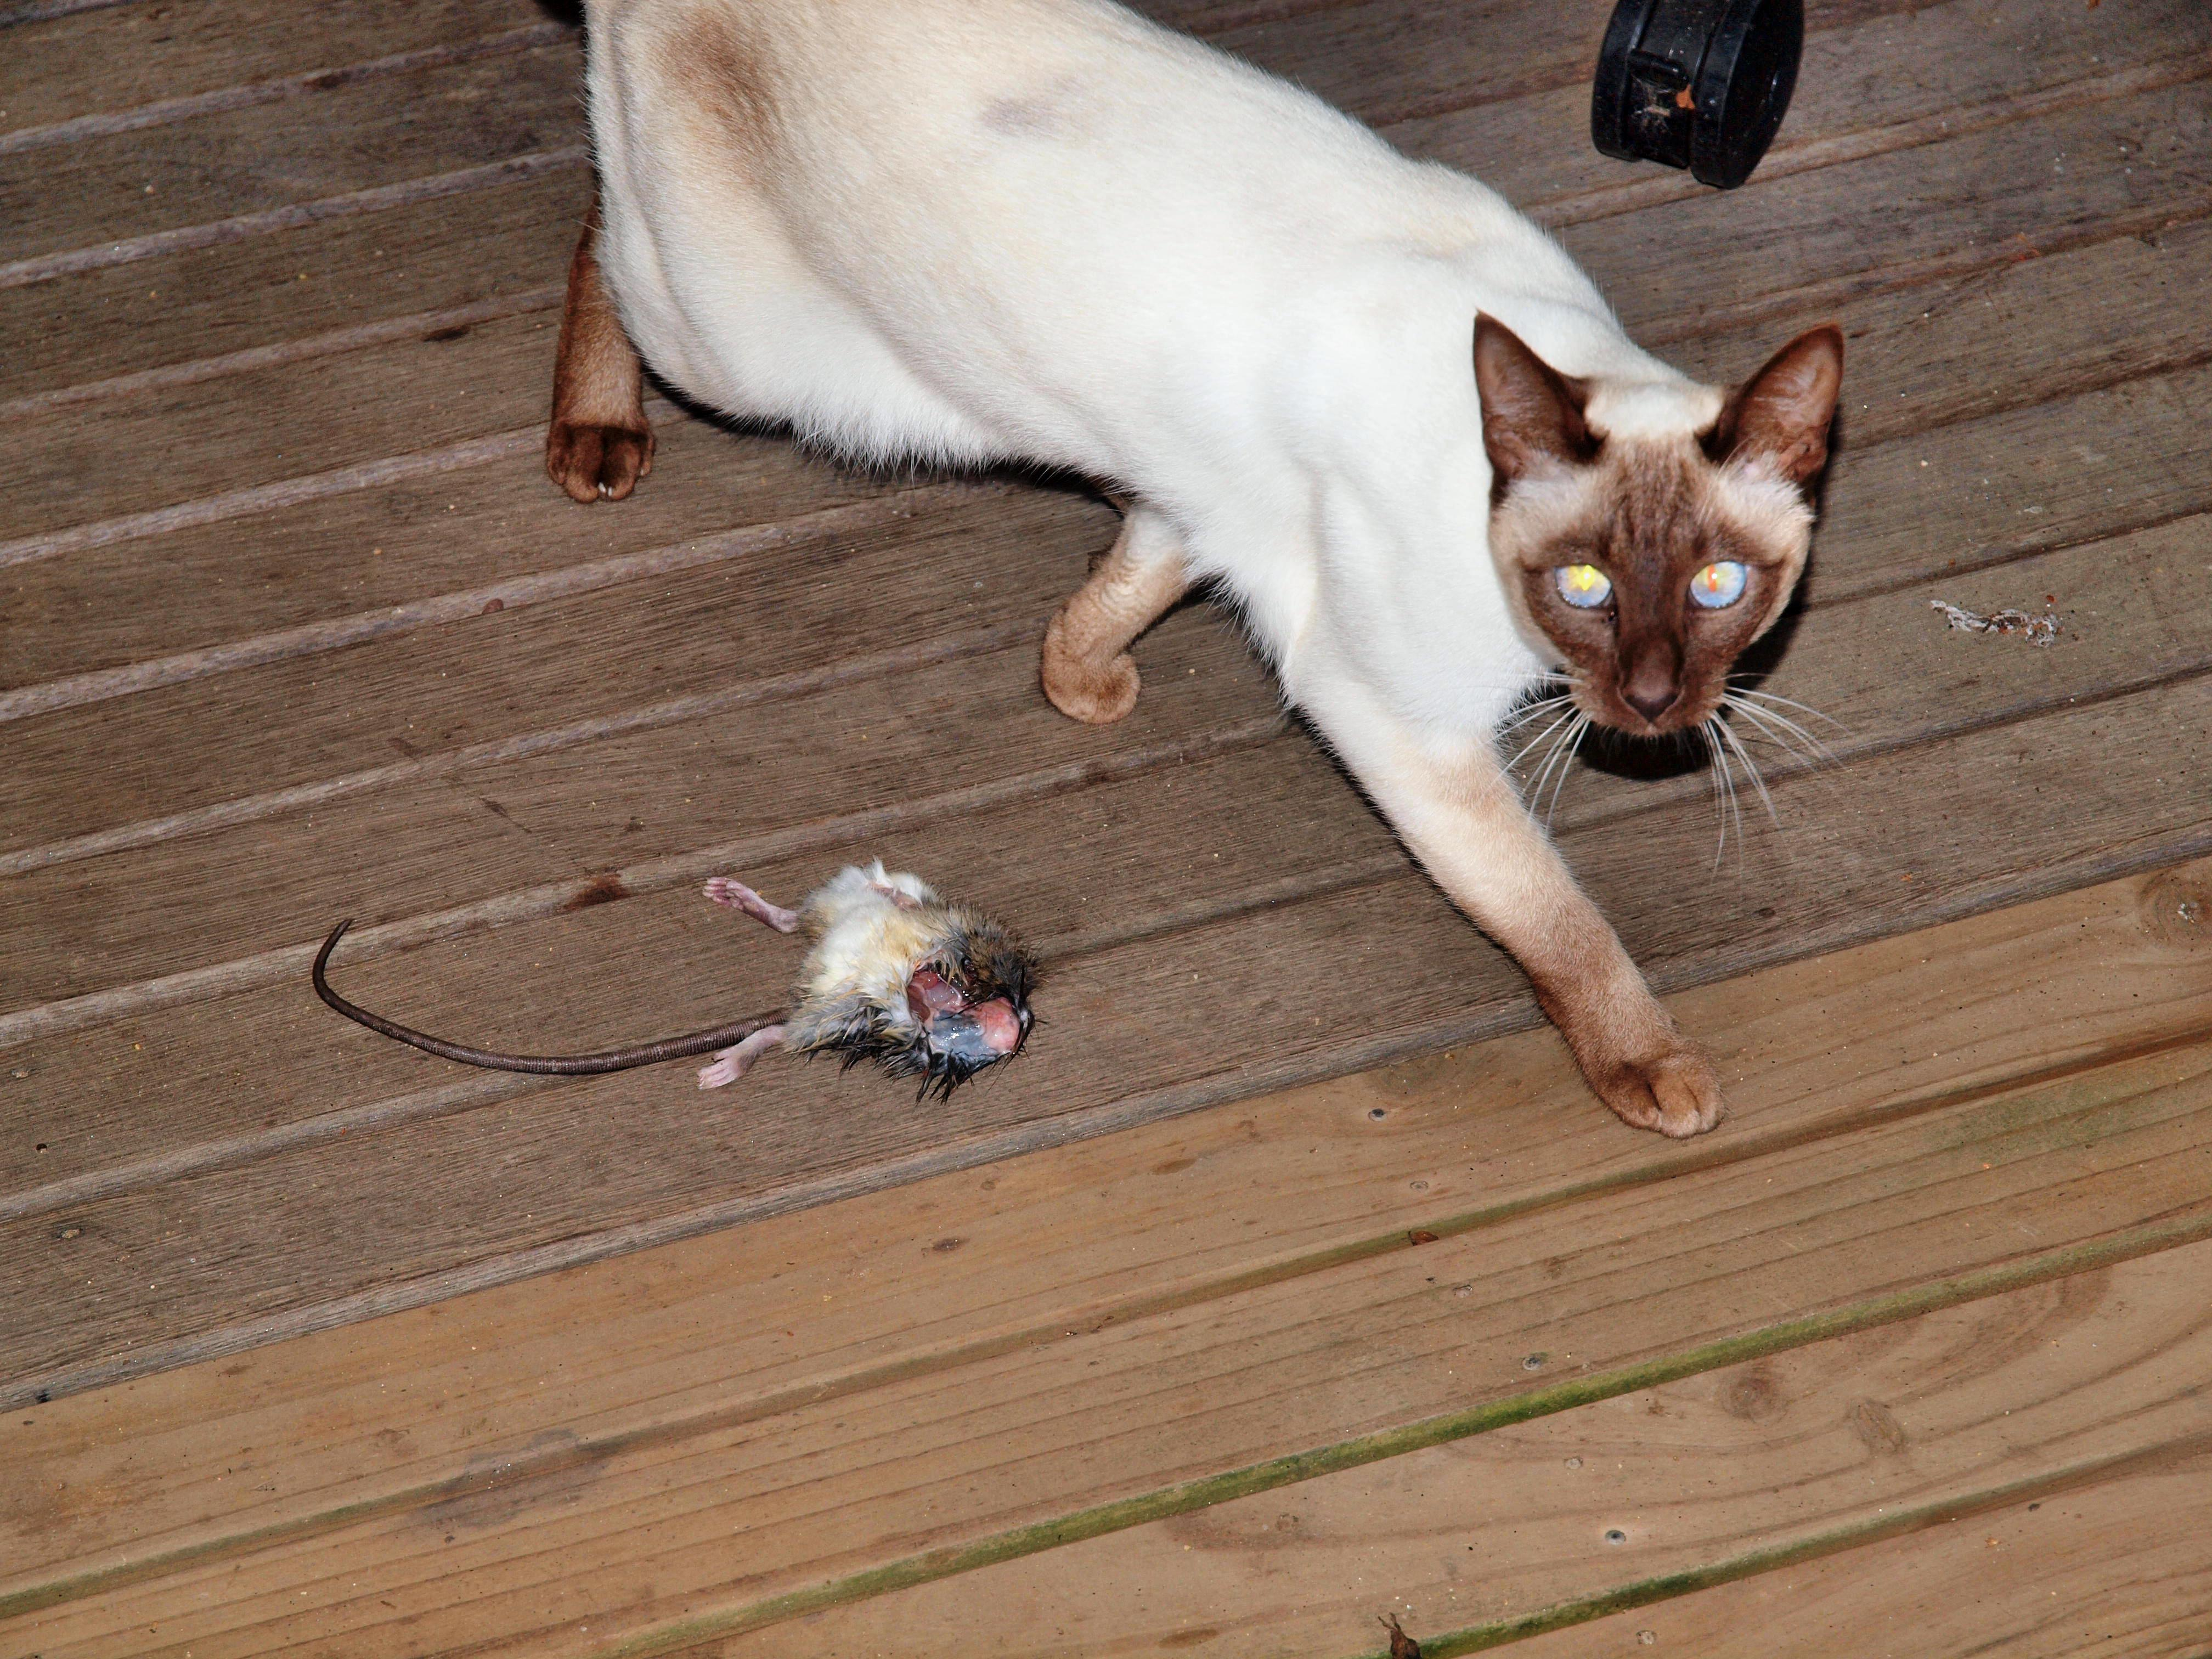 Piccola-and-rat-1.jpeg